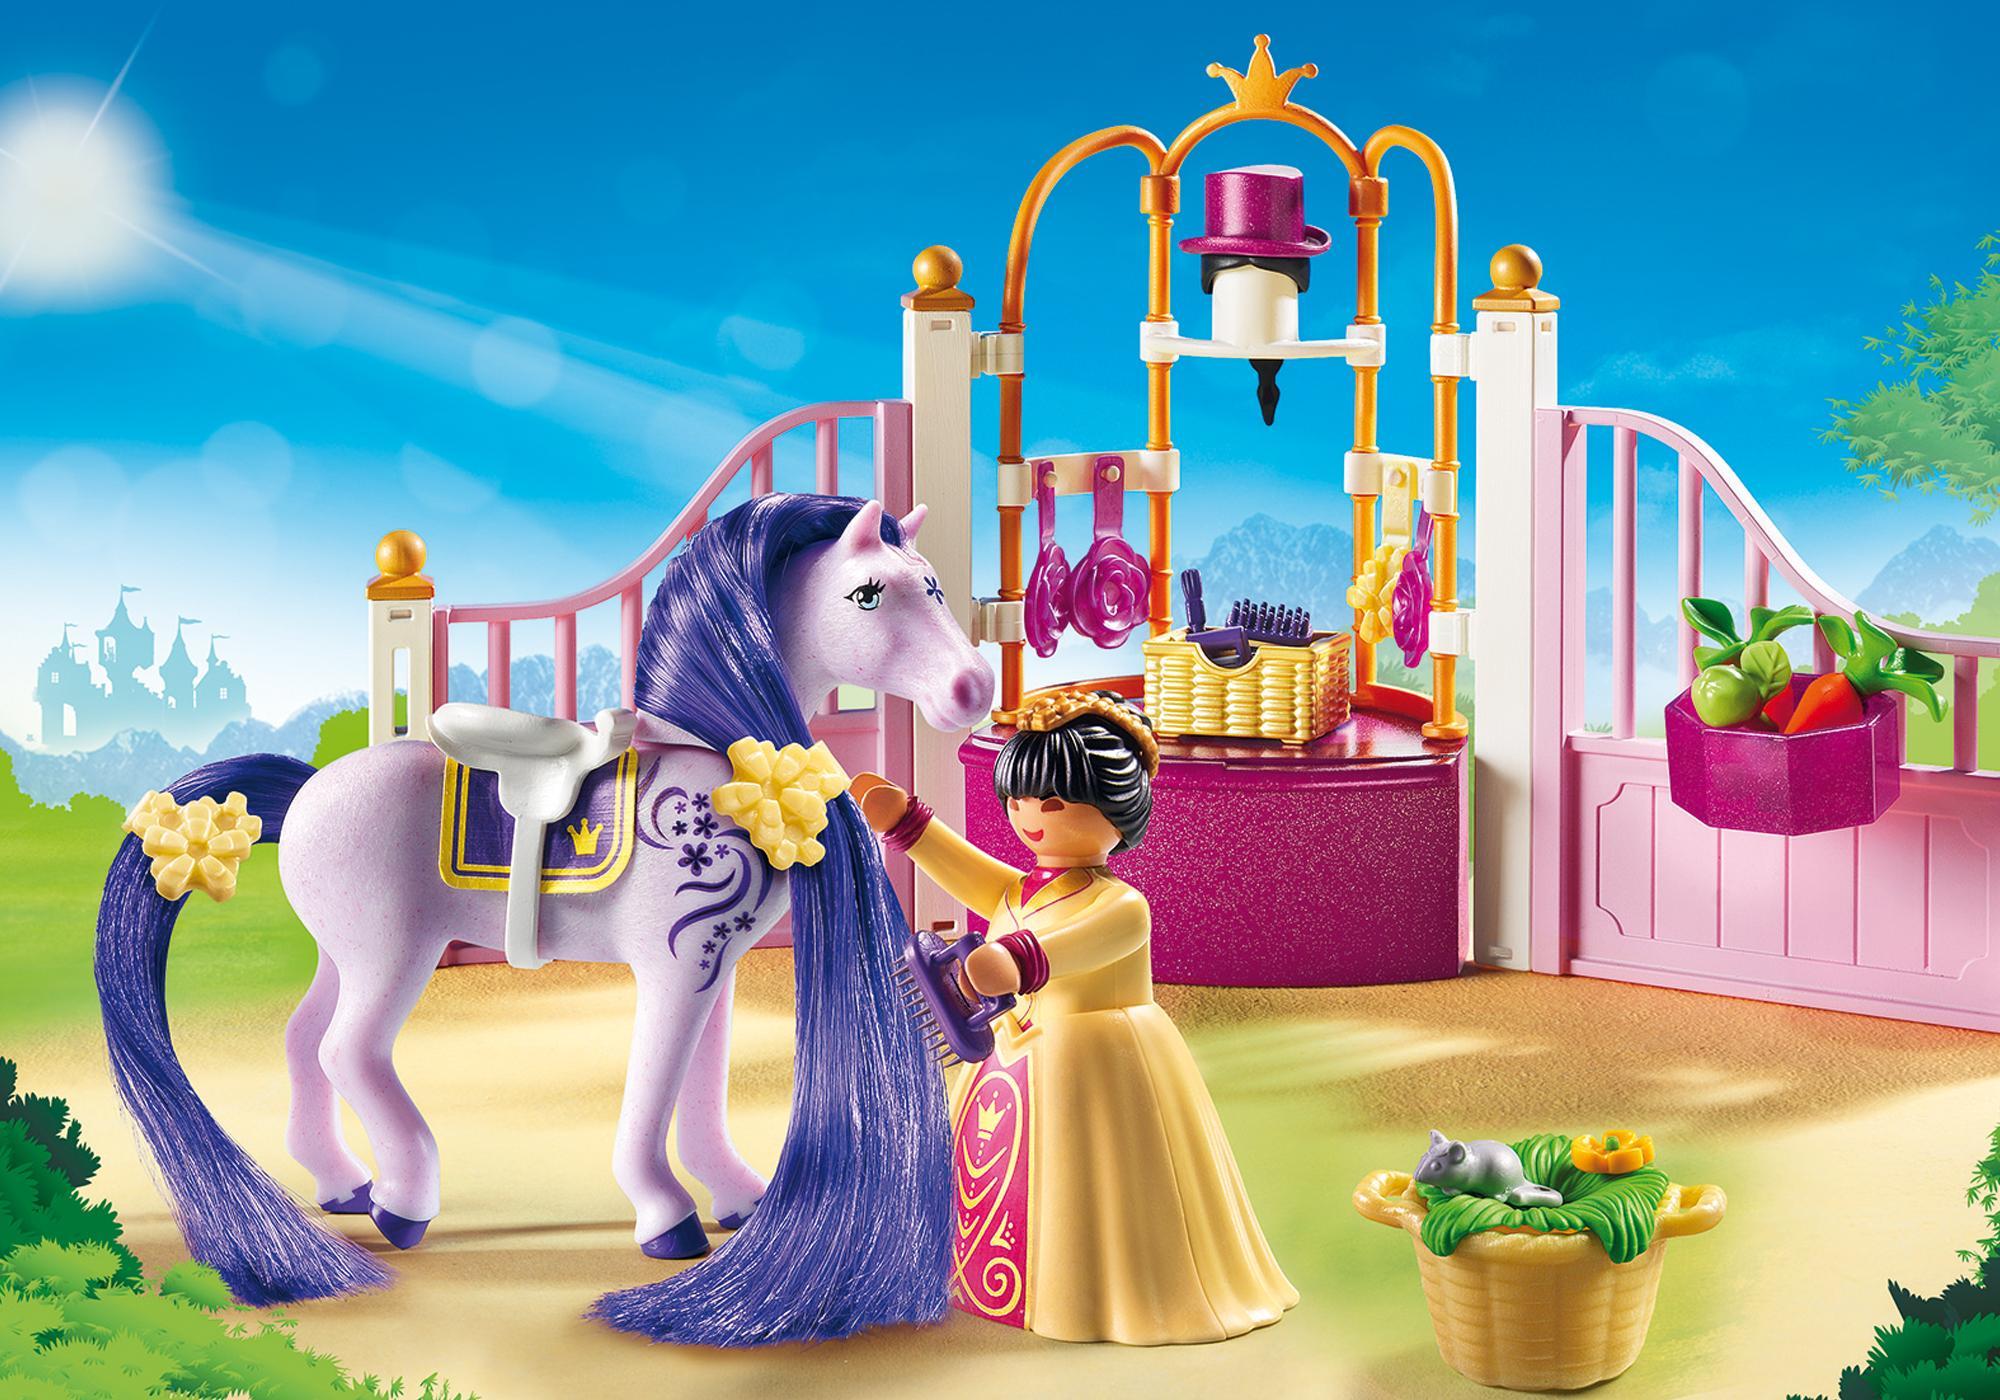 http://media.playmobil.com/i/playmobil/6855_product_detail/Ecurie avec cheval à coiffer et princesse